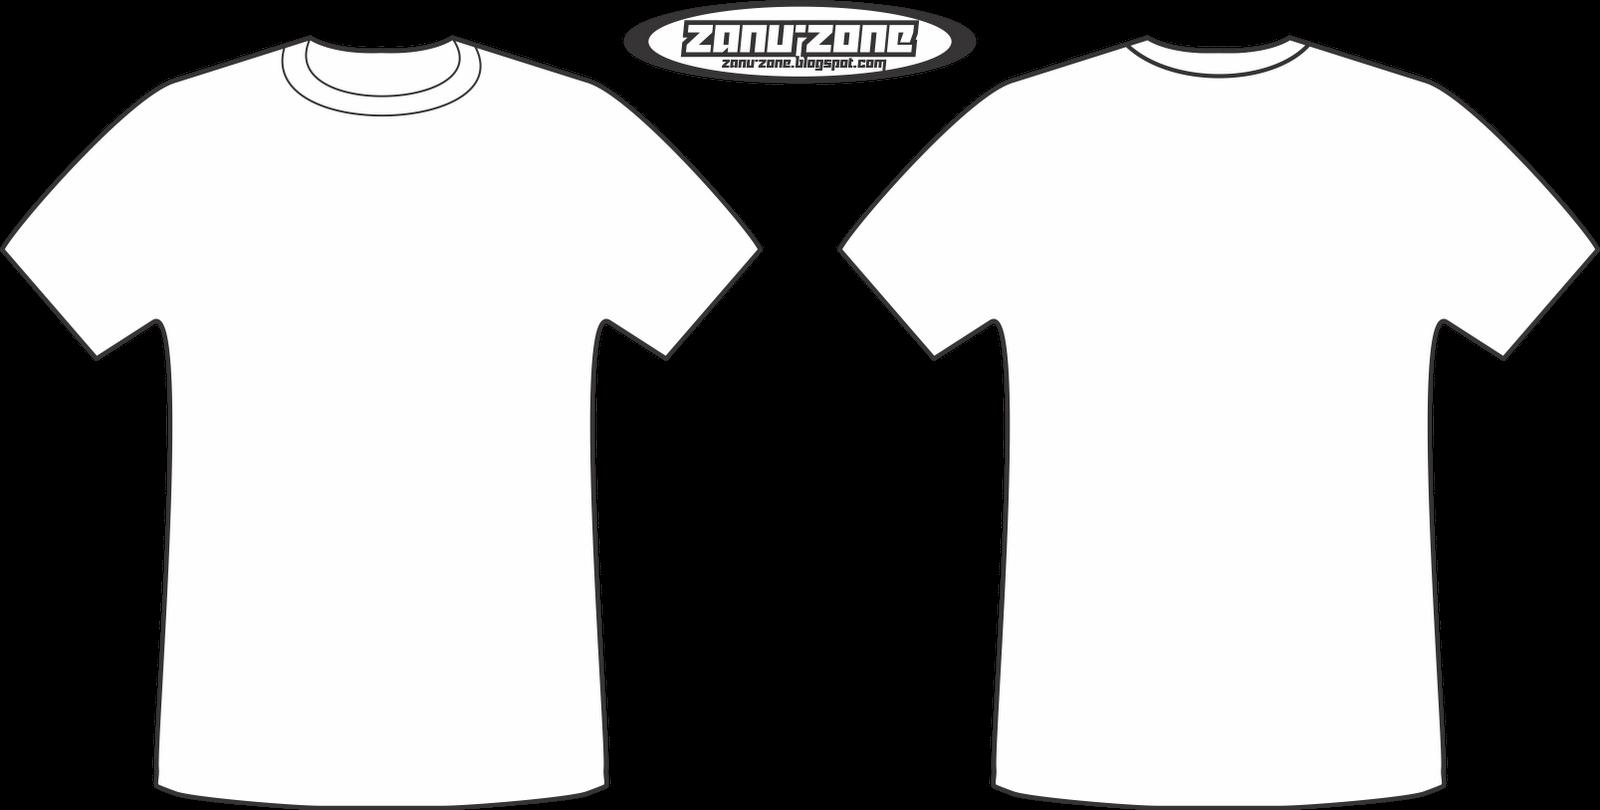 Template Desain Kaos Polos Depan